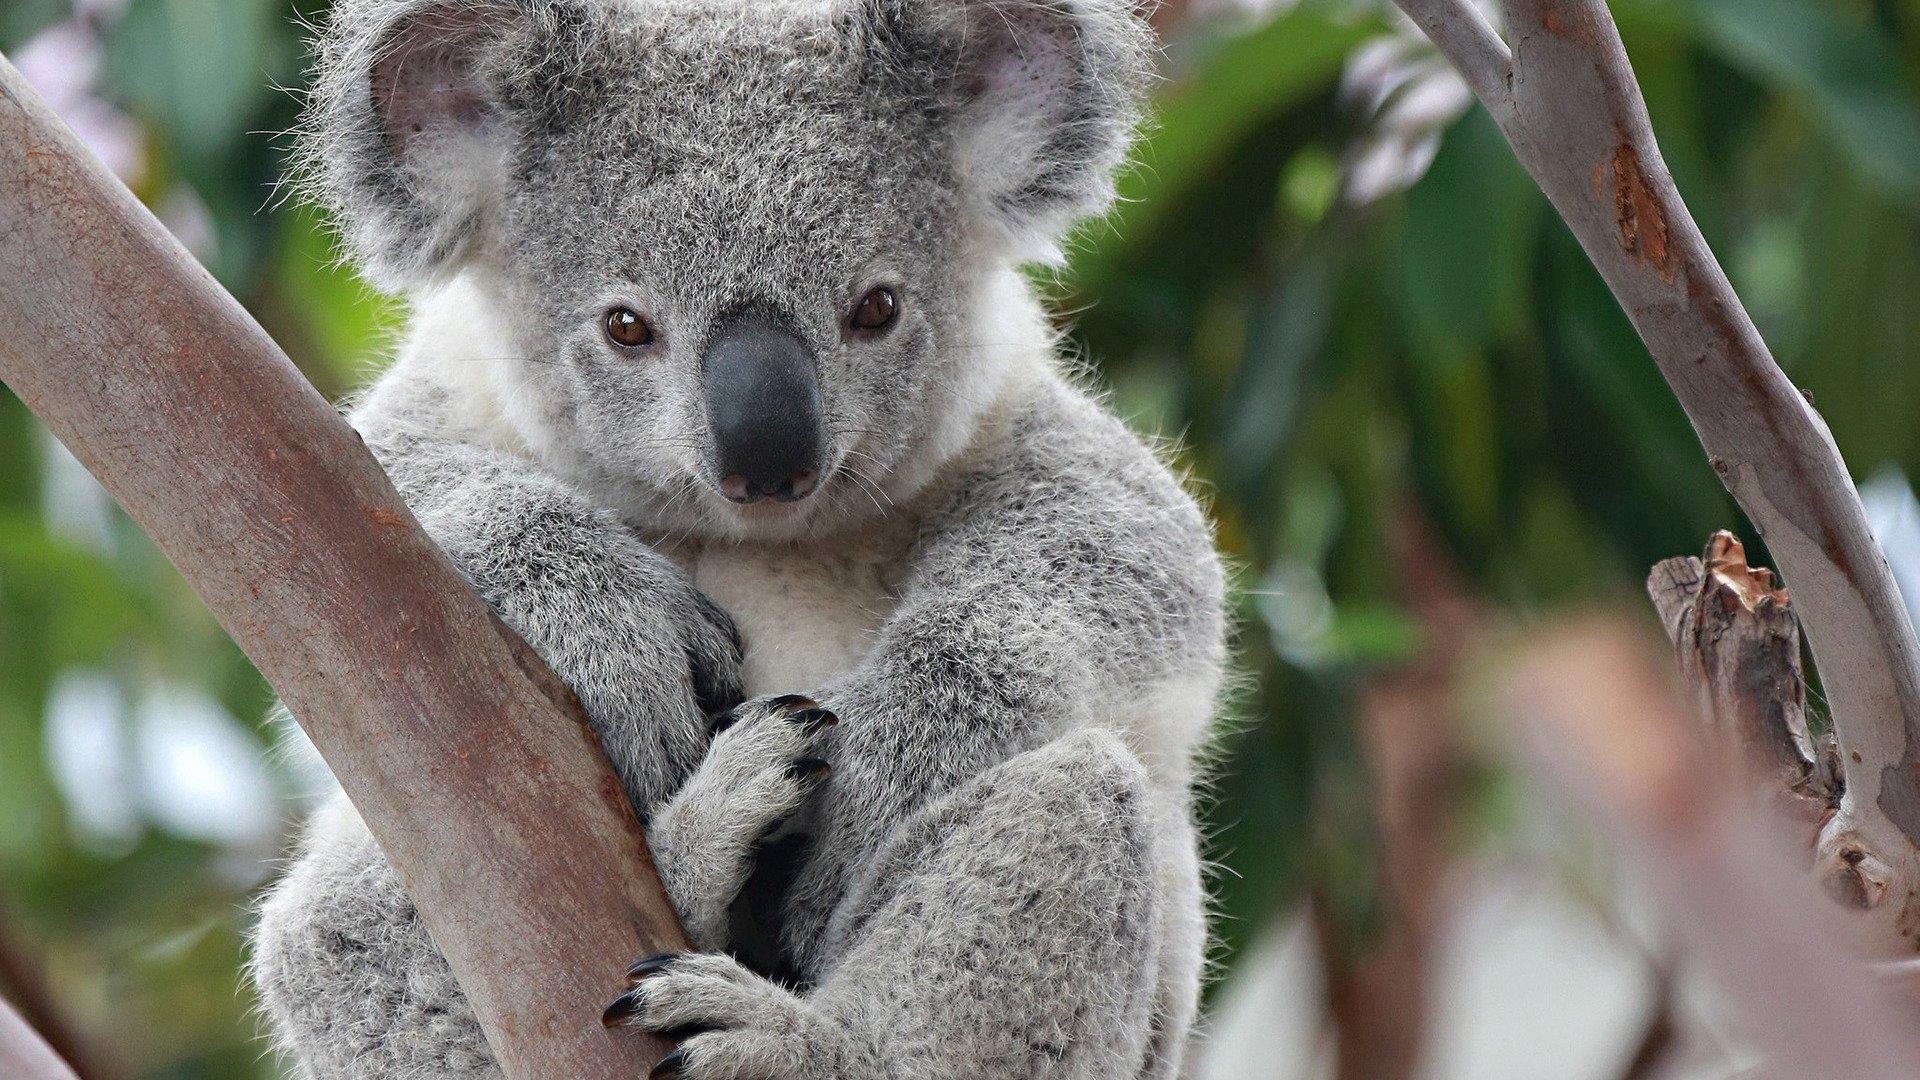 fond d'ecran koala